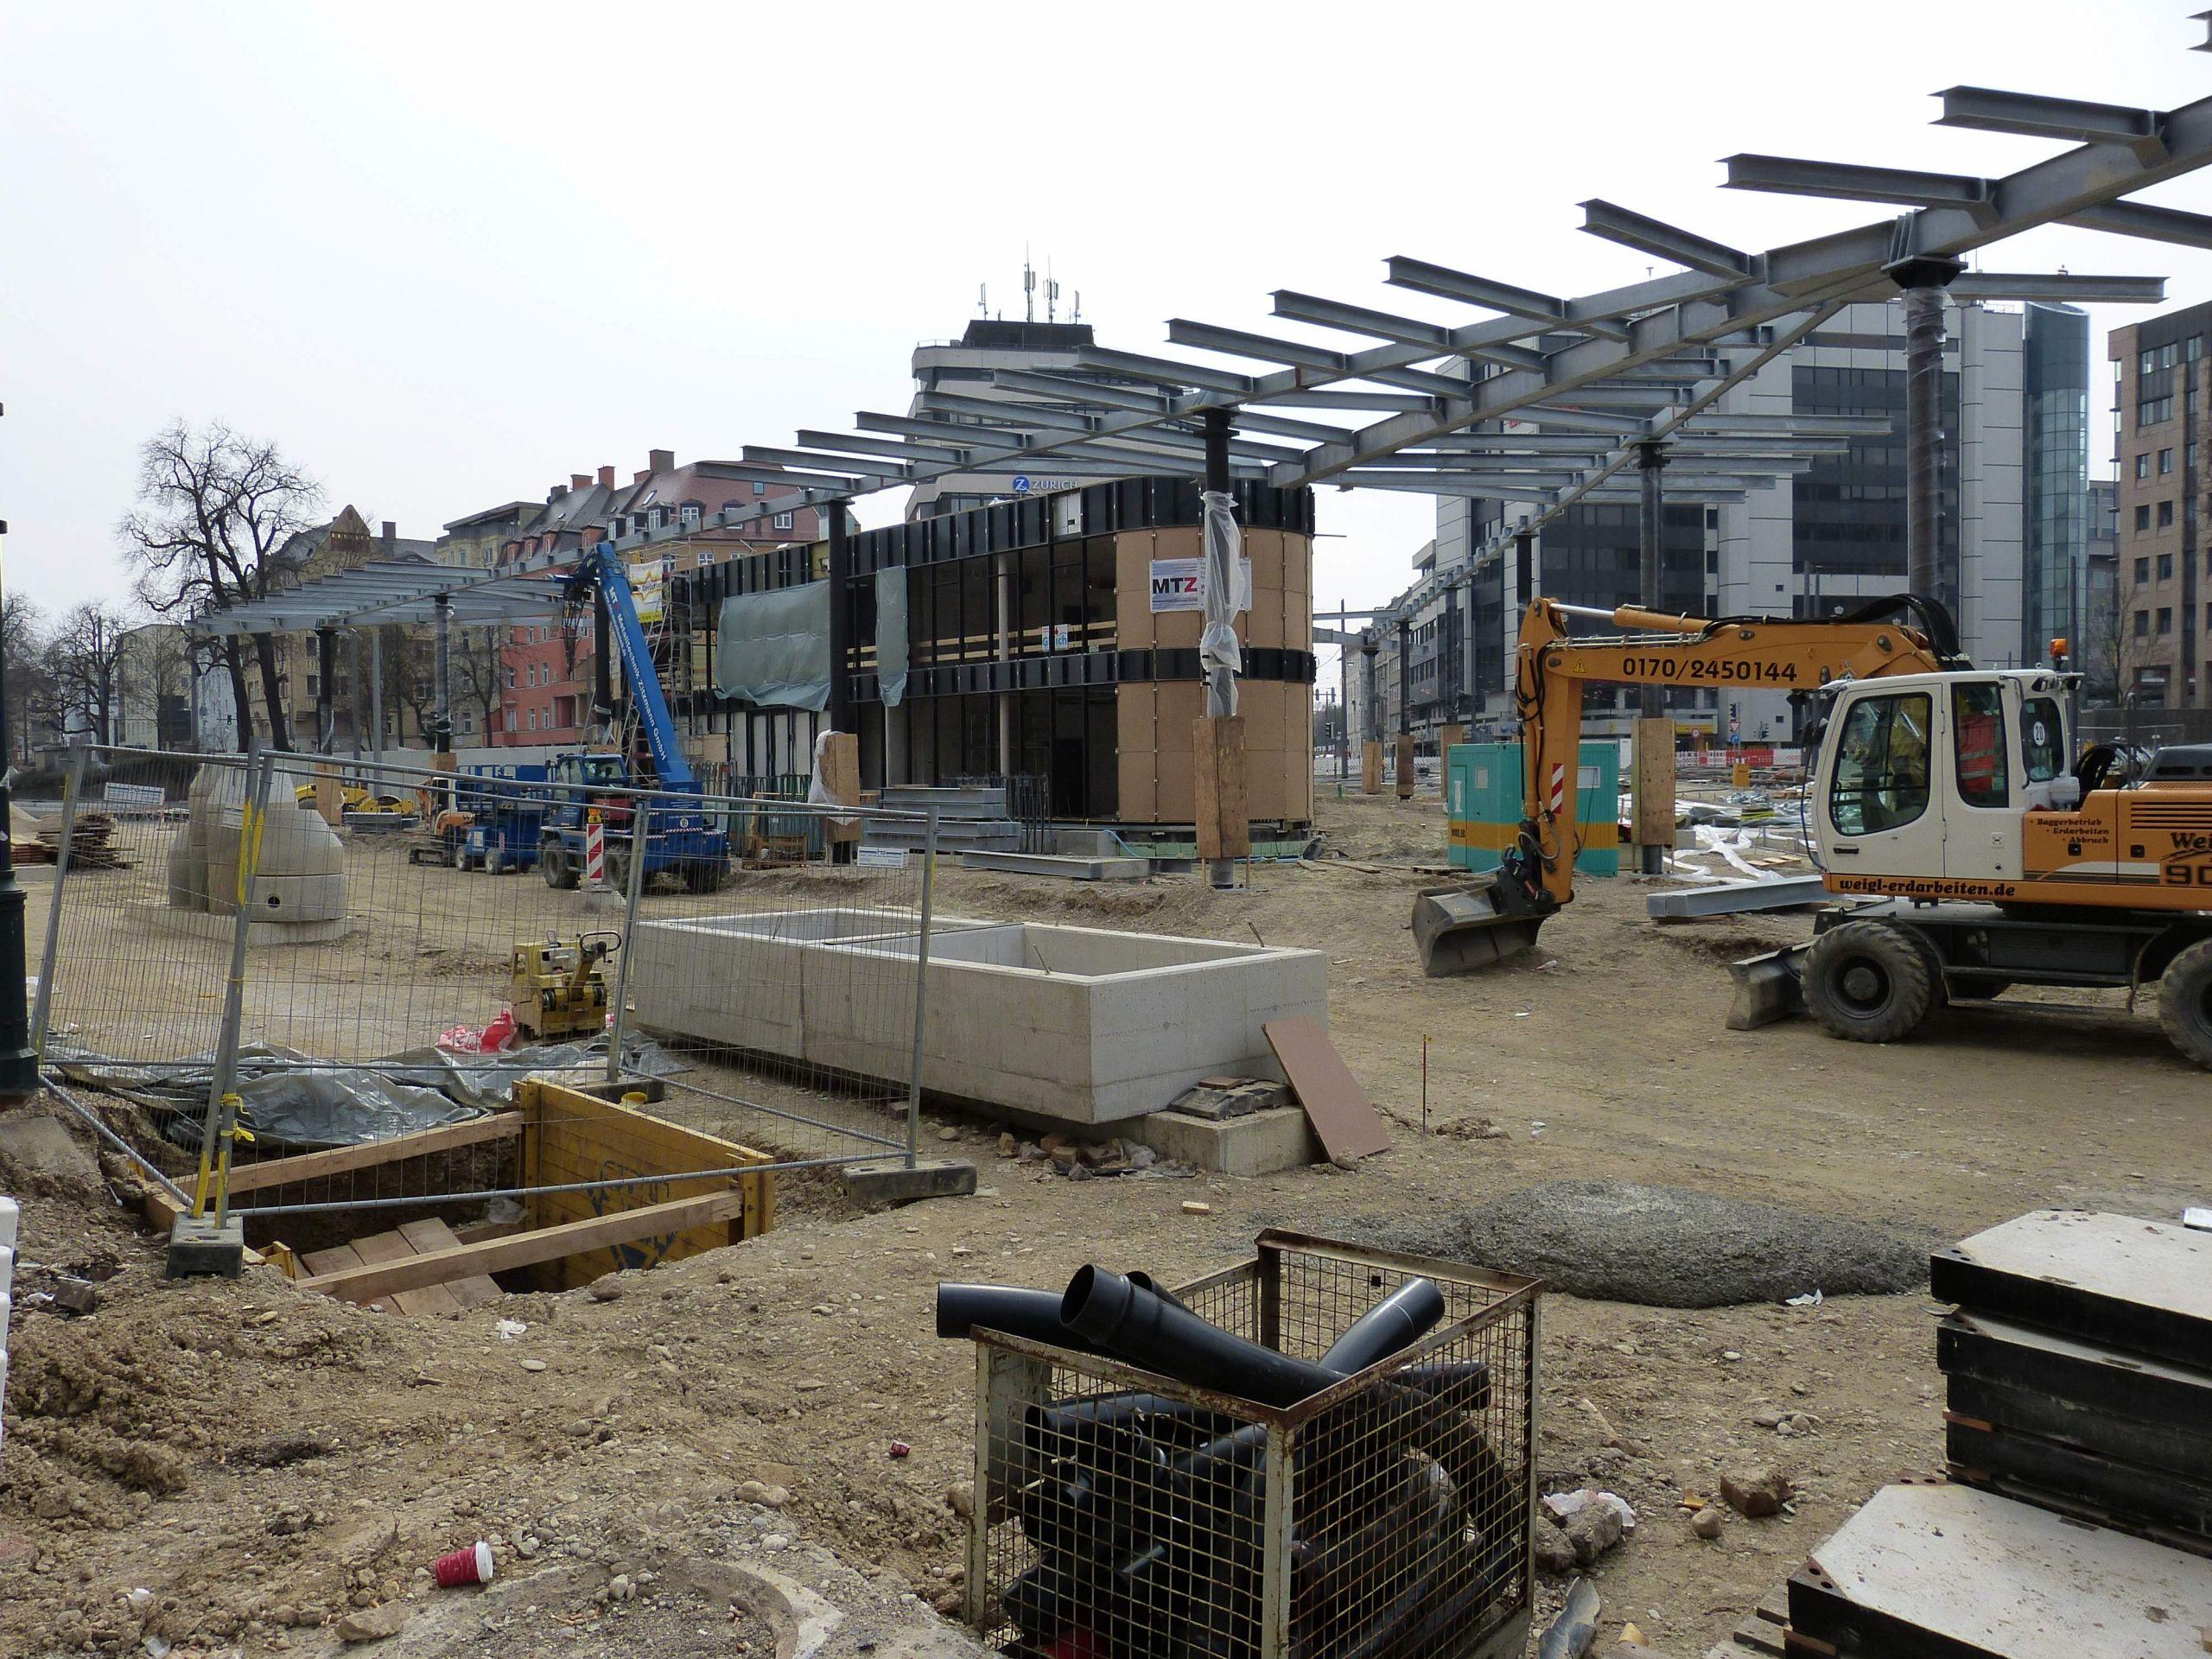 Königsplatz Baustelle Projekt Augsburg City JPG